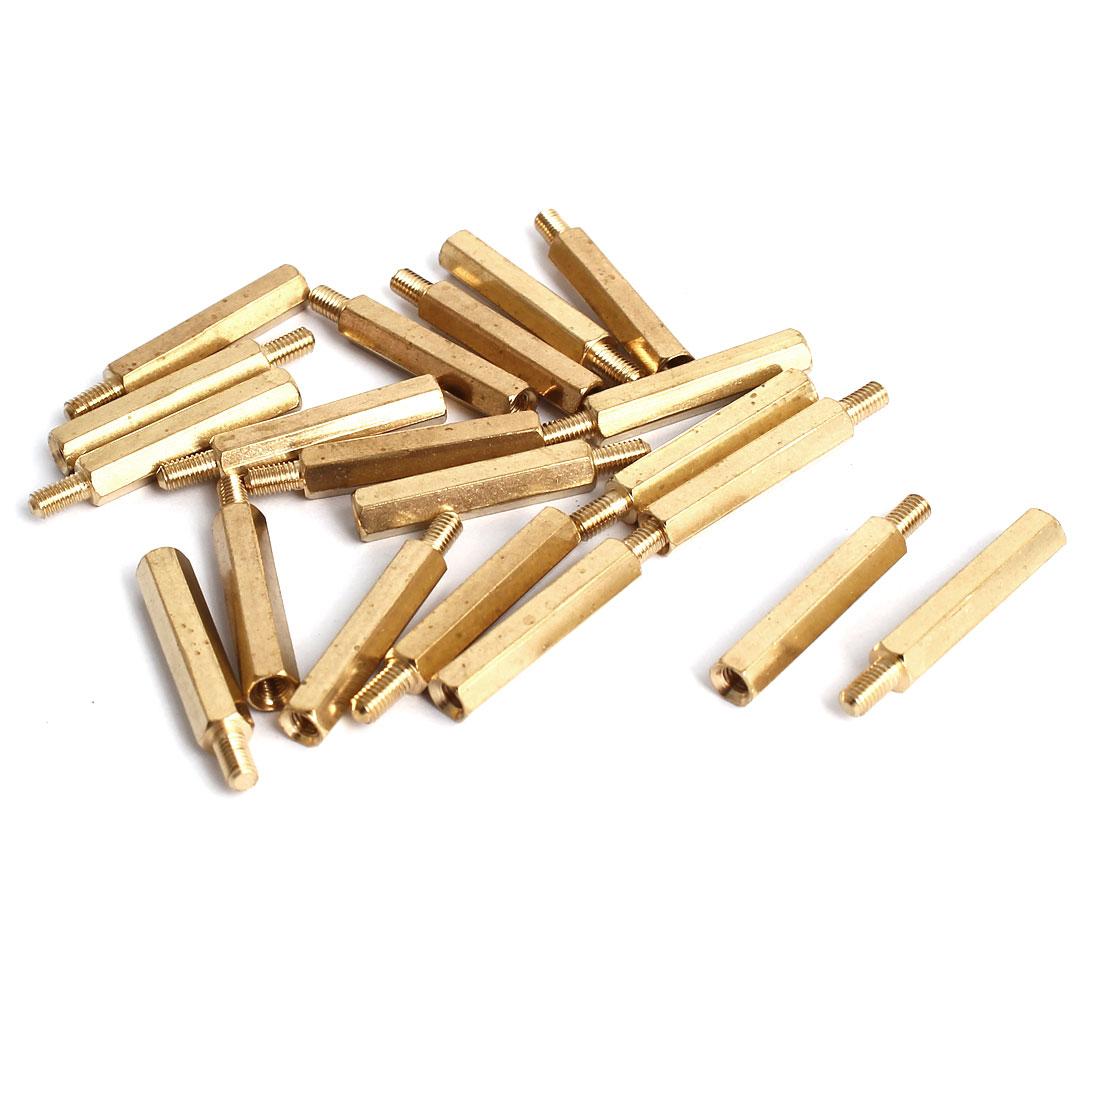 M3x23+6mm Male/Female Threaded Brass Hex Tapped Hexagonal Spacer Standoff Pillar 20pcs